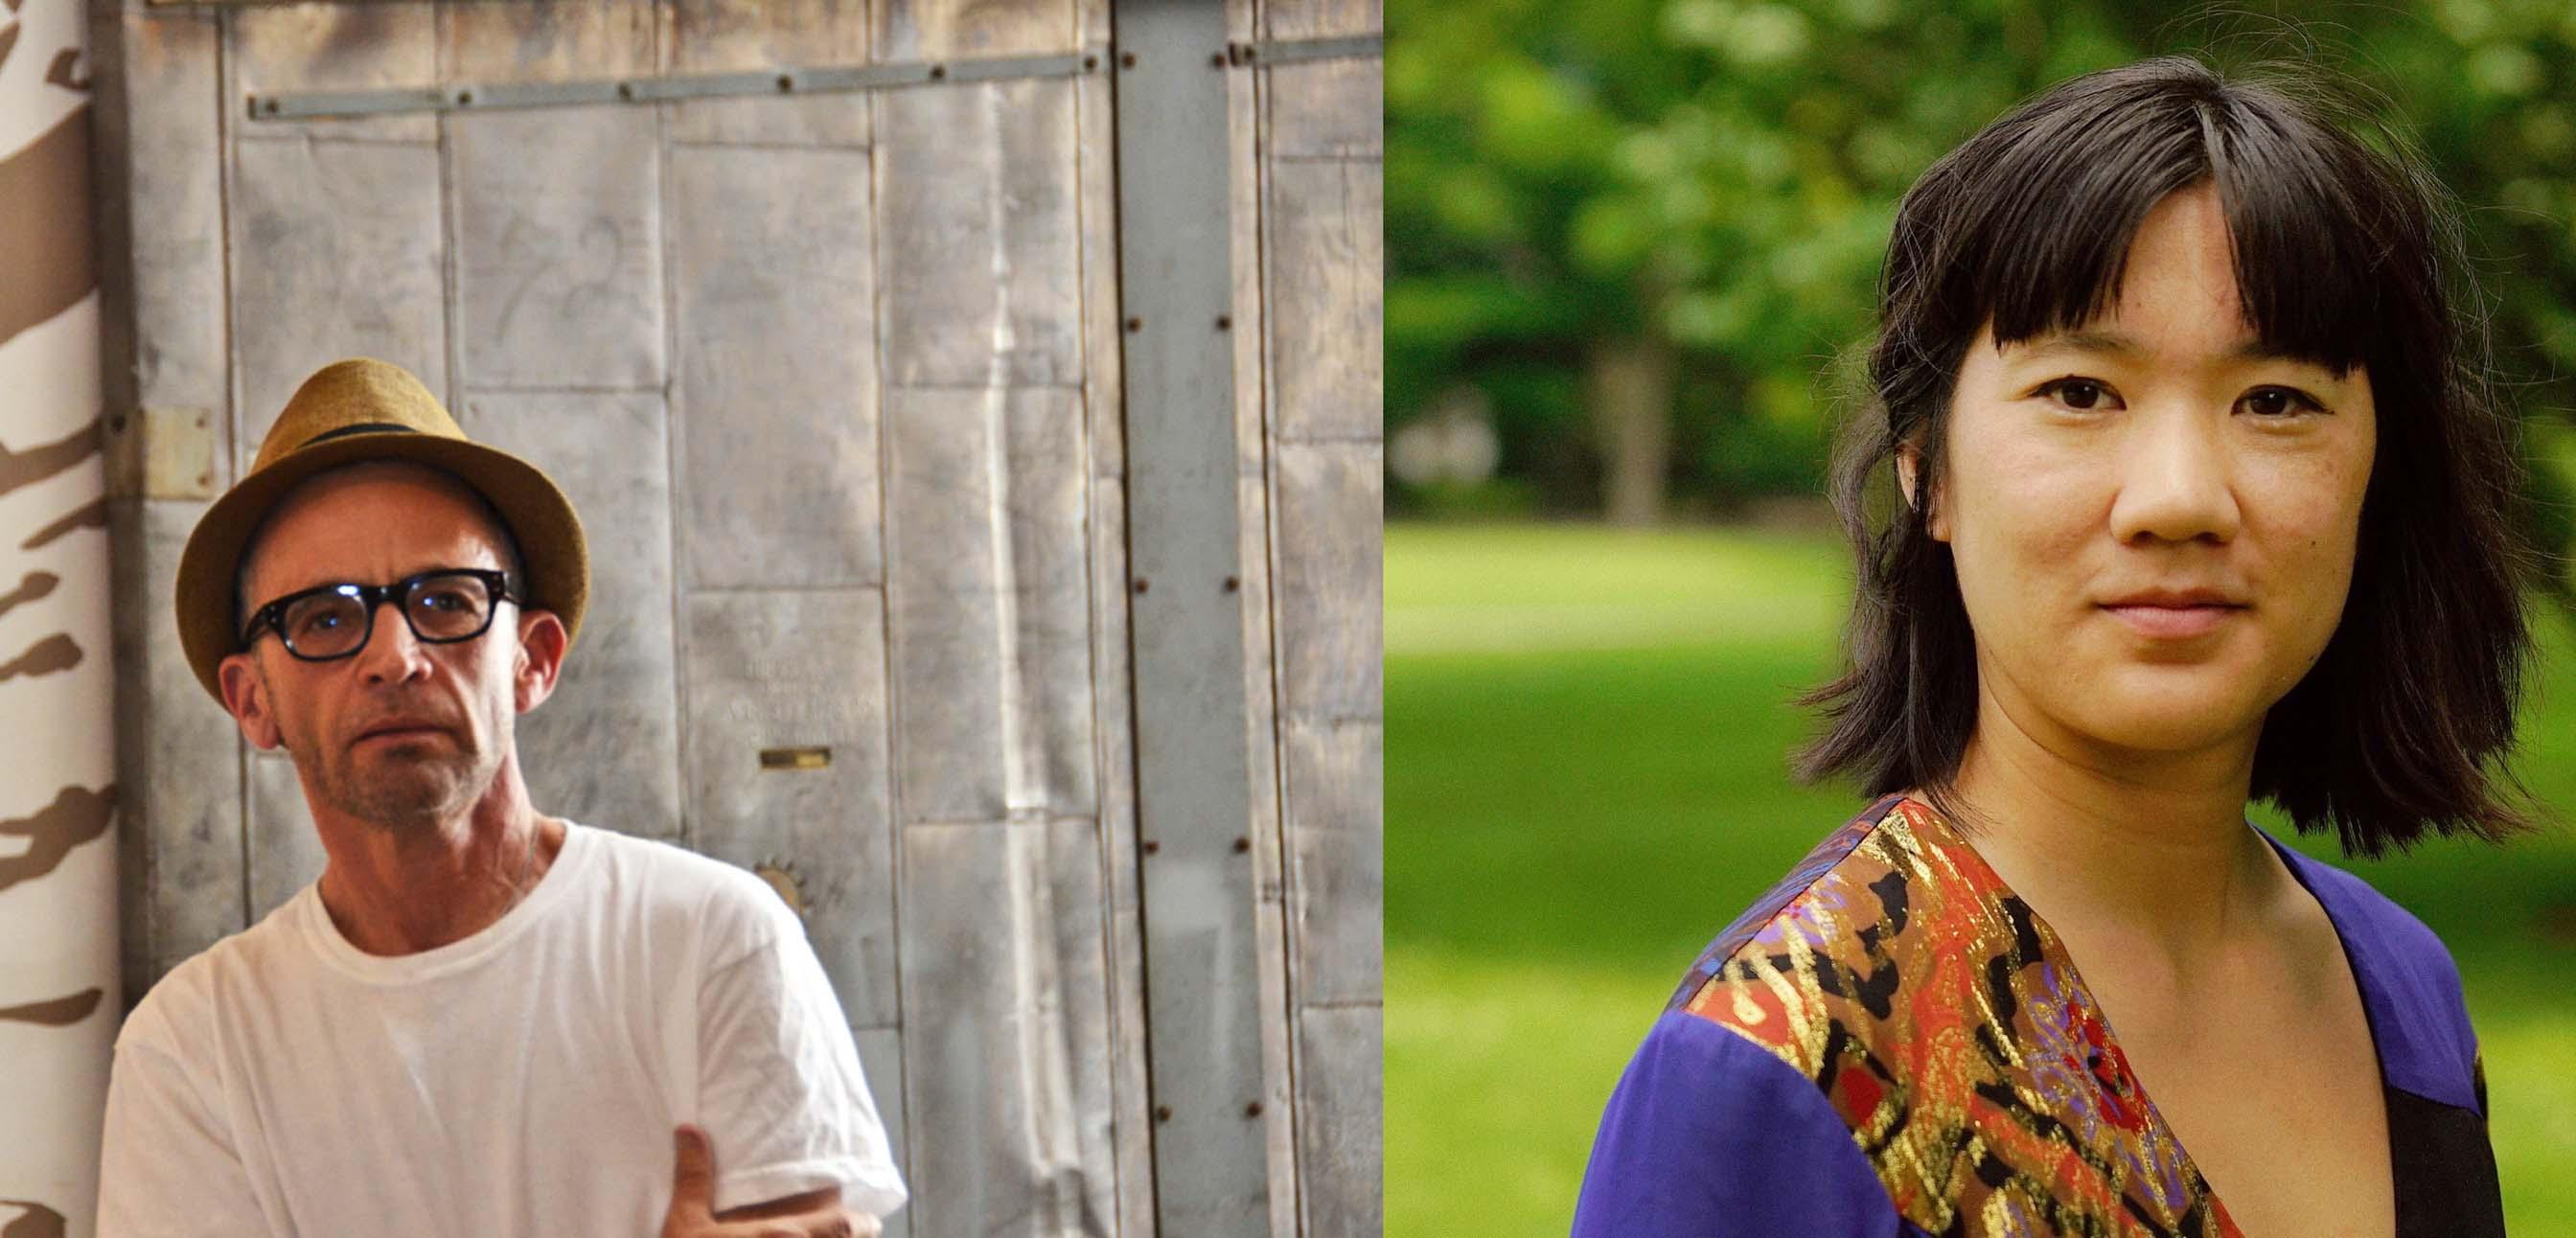 Sam Ace and Diana Khoi Nguyen, Wednesday, May 22, 2019, 7pm